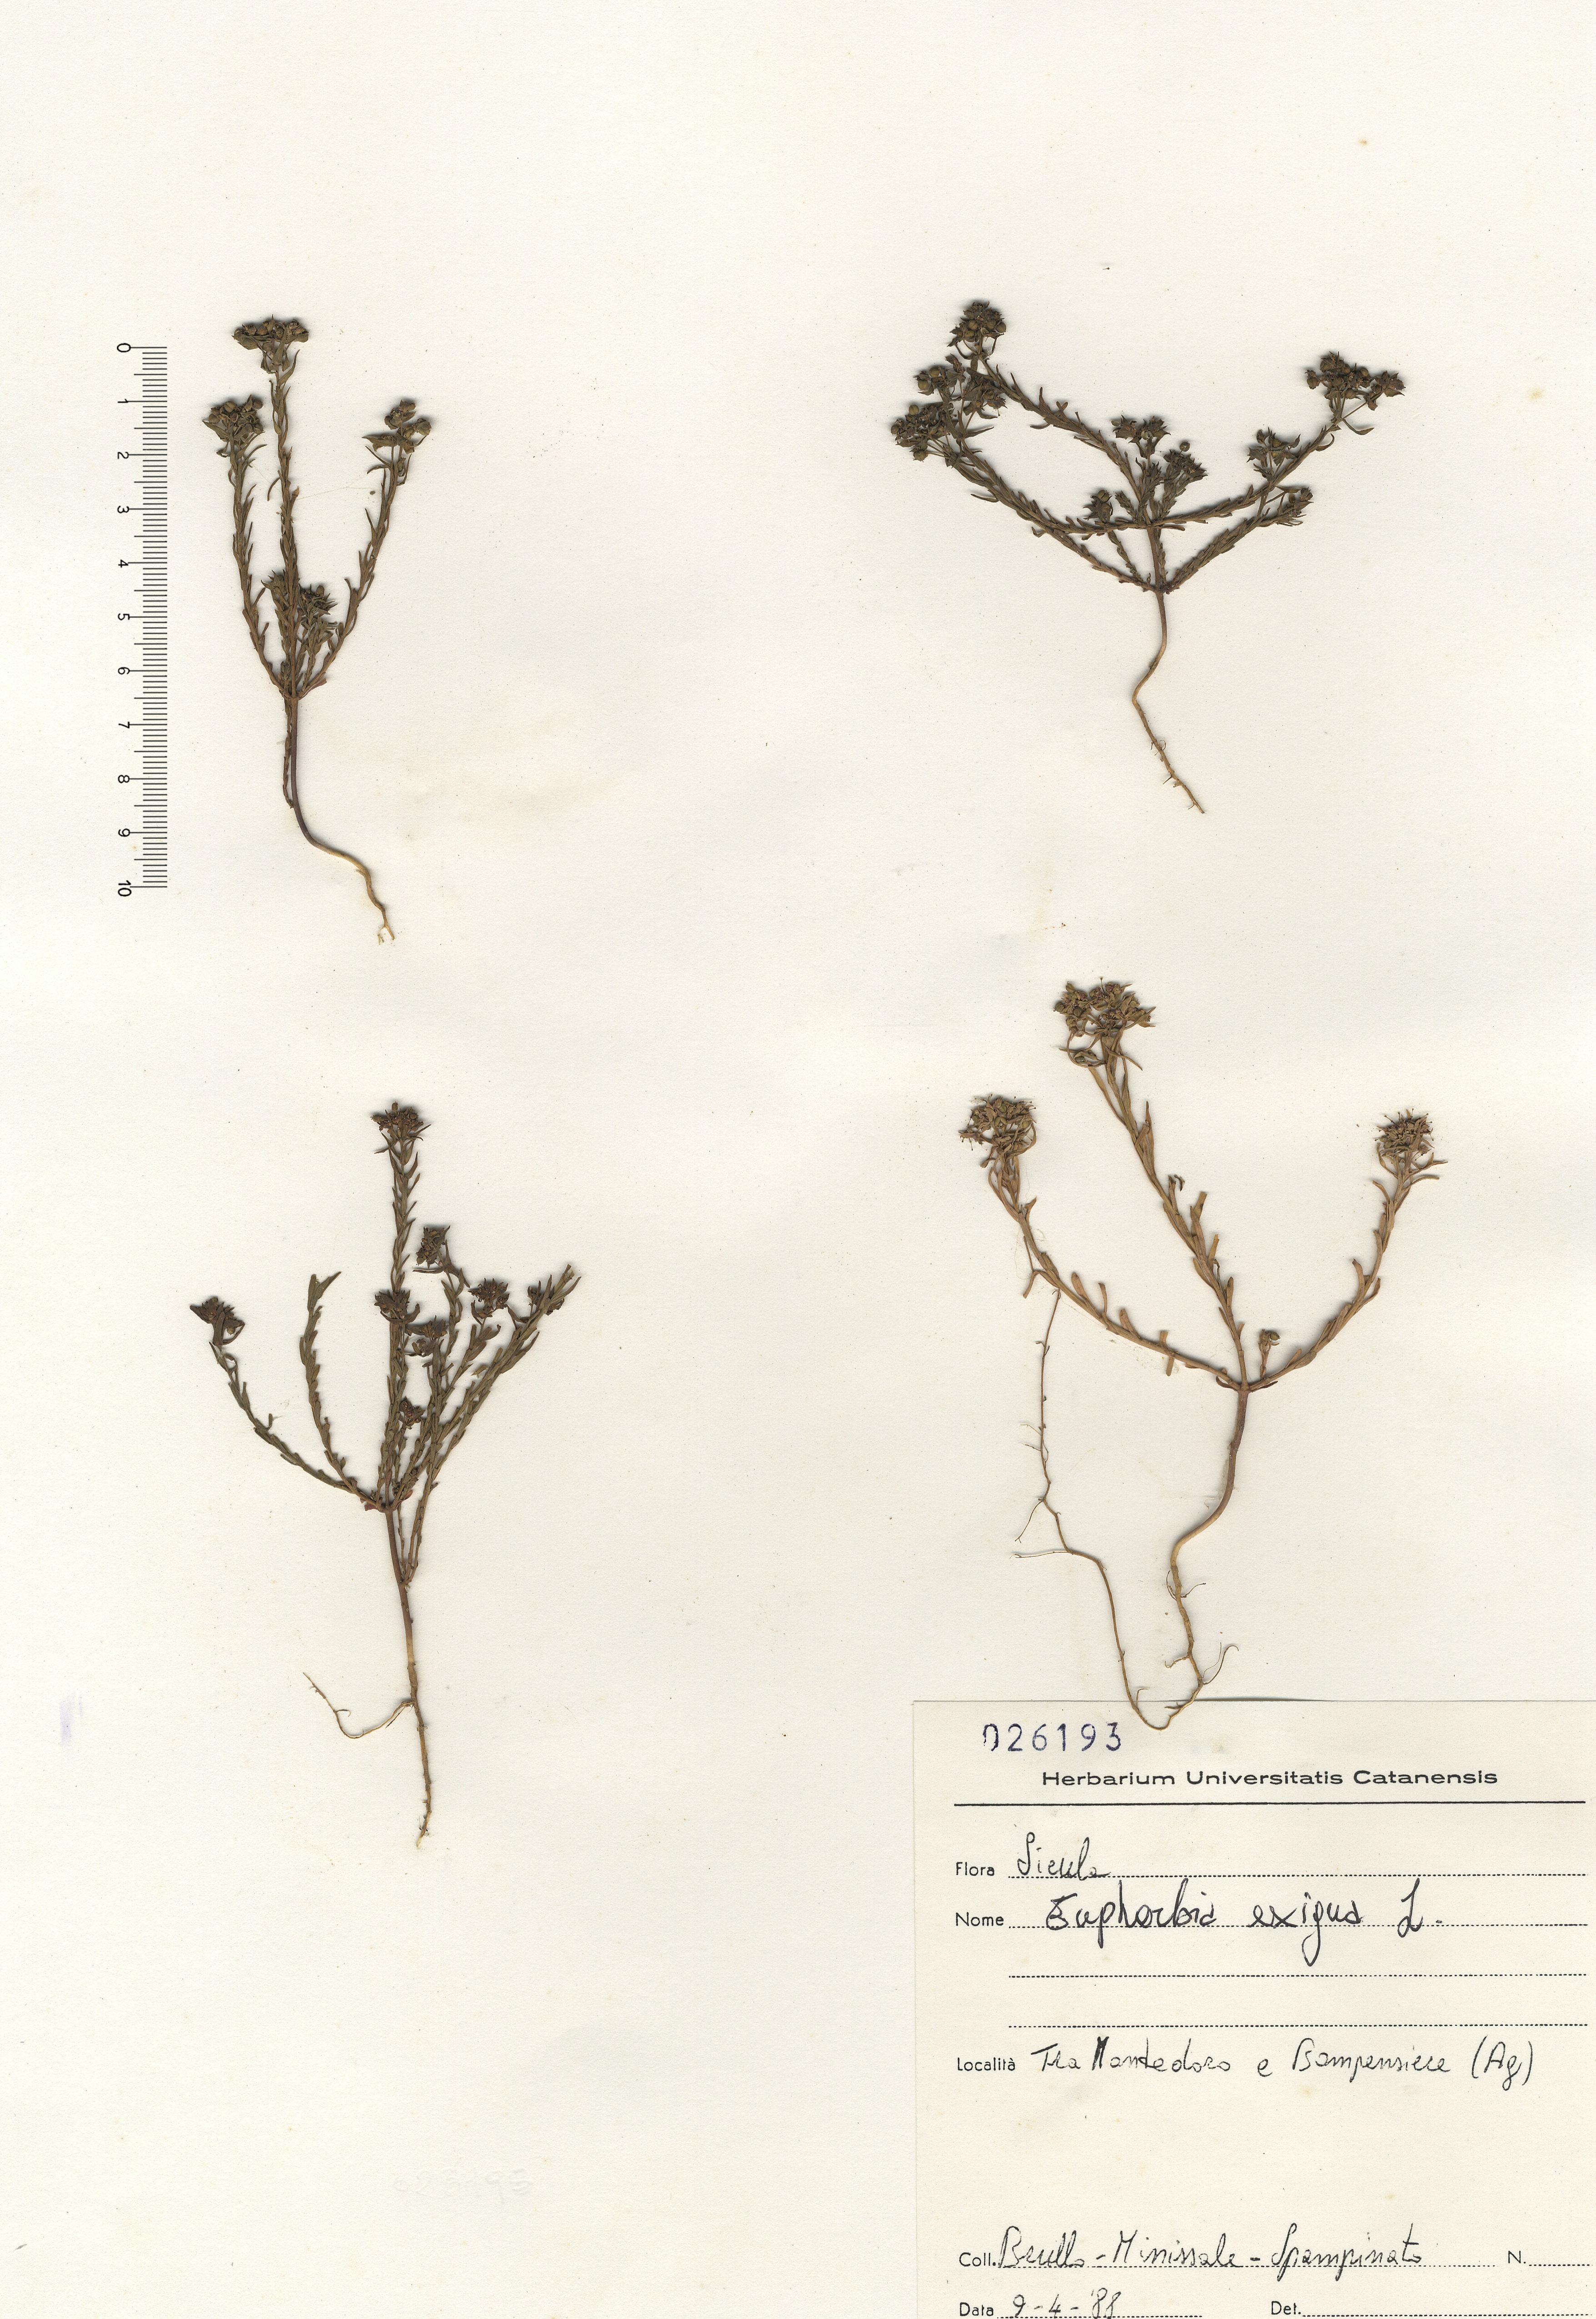 © Hortus Botanicus Catinens - Herb. shhet 026193<br>